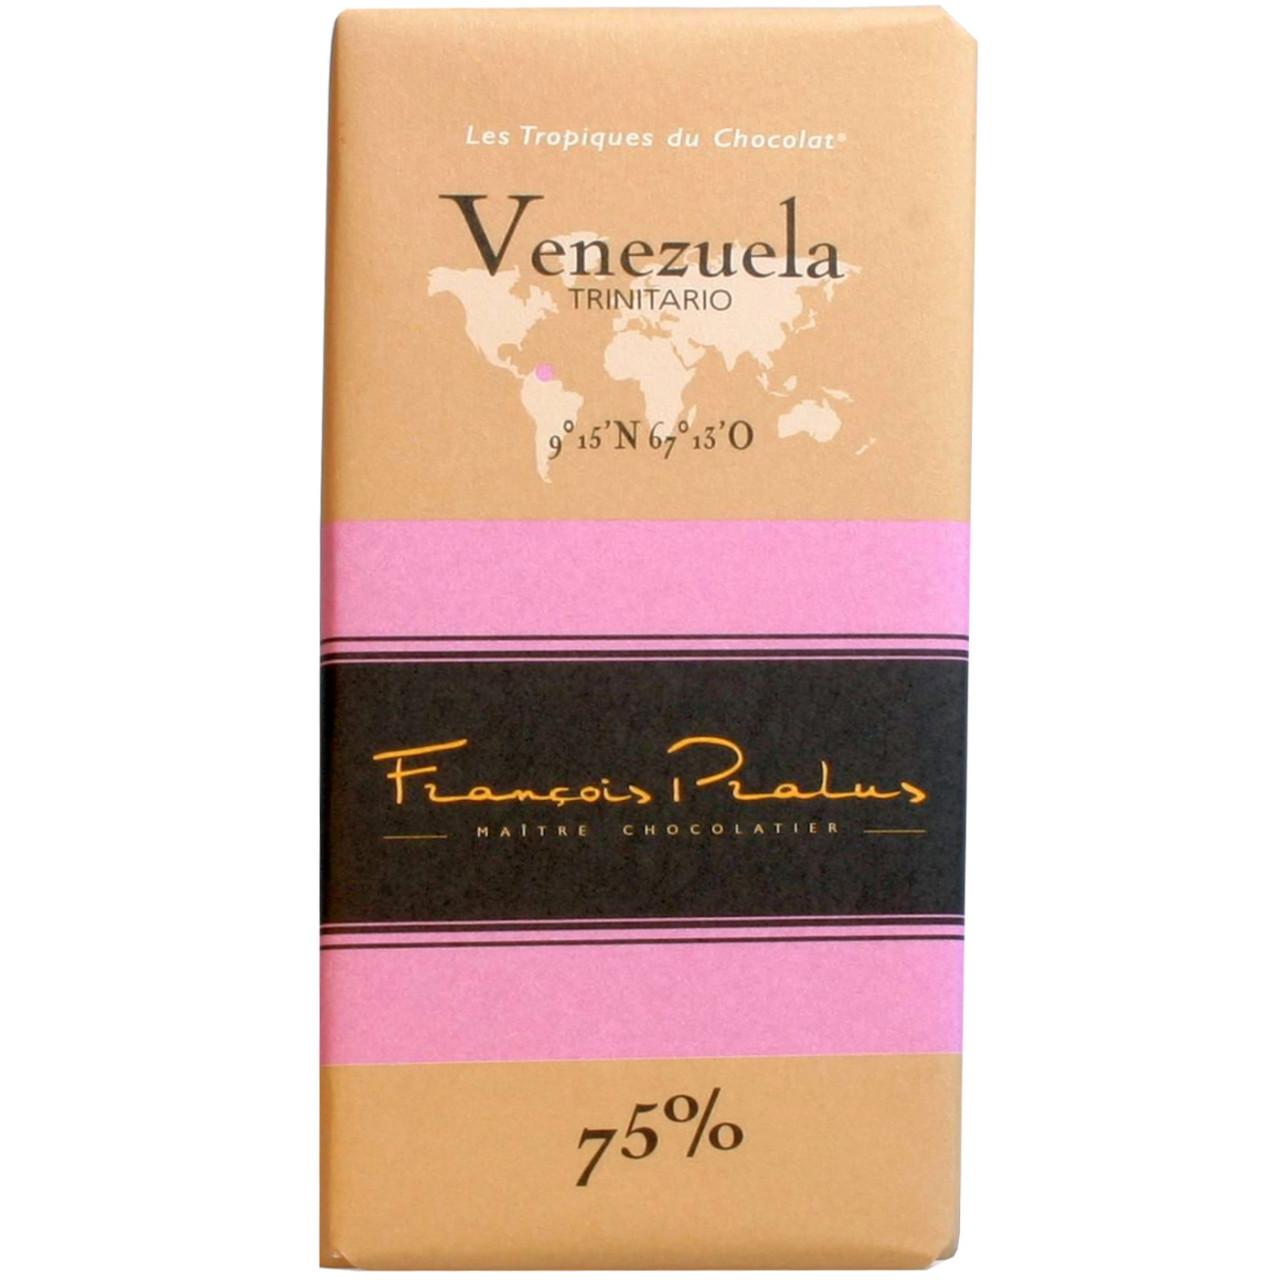 Dunkle Schokolade, 75%, Venezuela, Trinitario, chocolat noir, dark chocolate, Herkunftsschokolade, bean to bar,